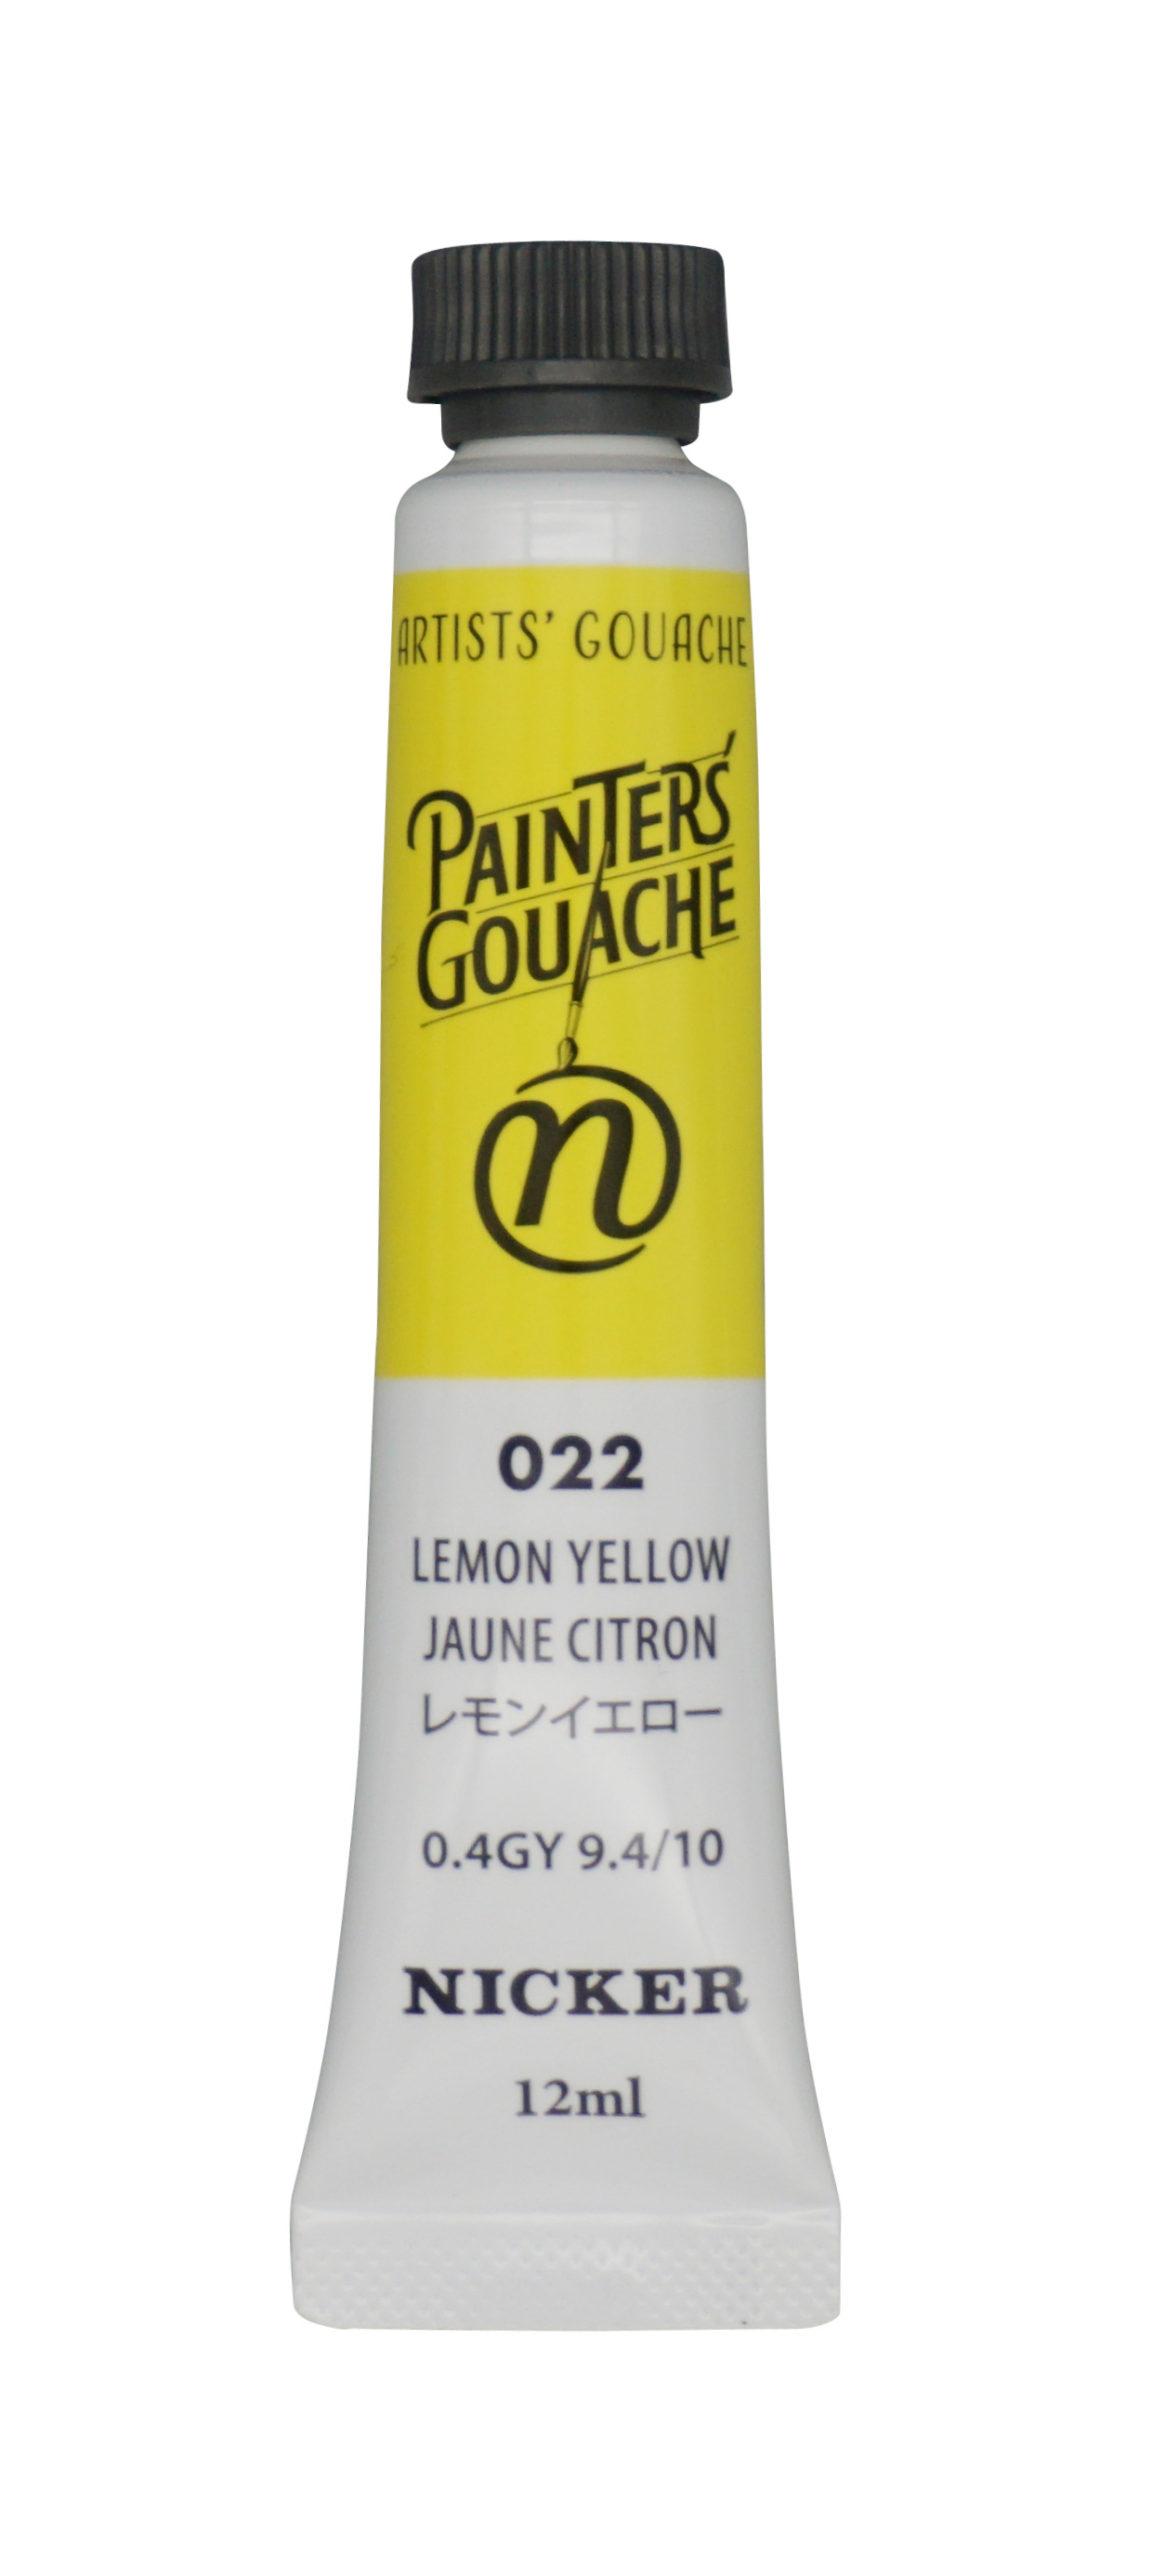 PAINTER'S GOUACHE LEMON YELLOW